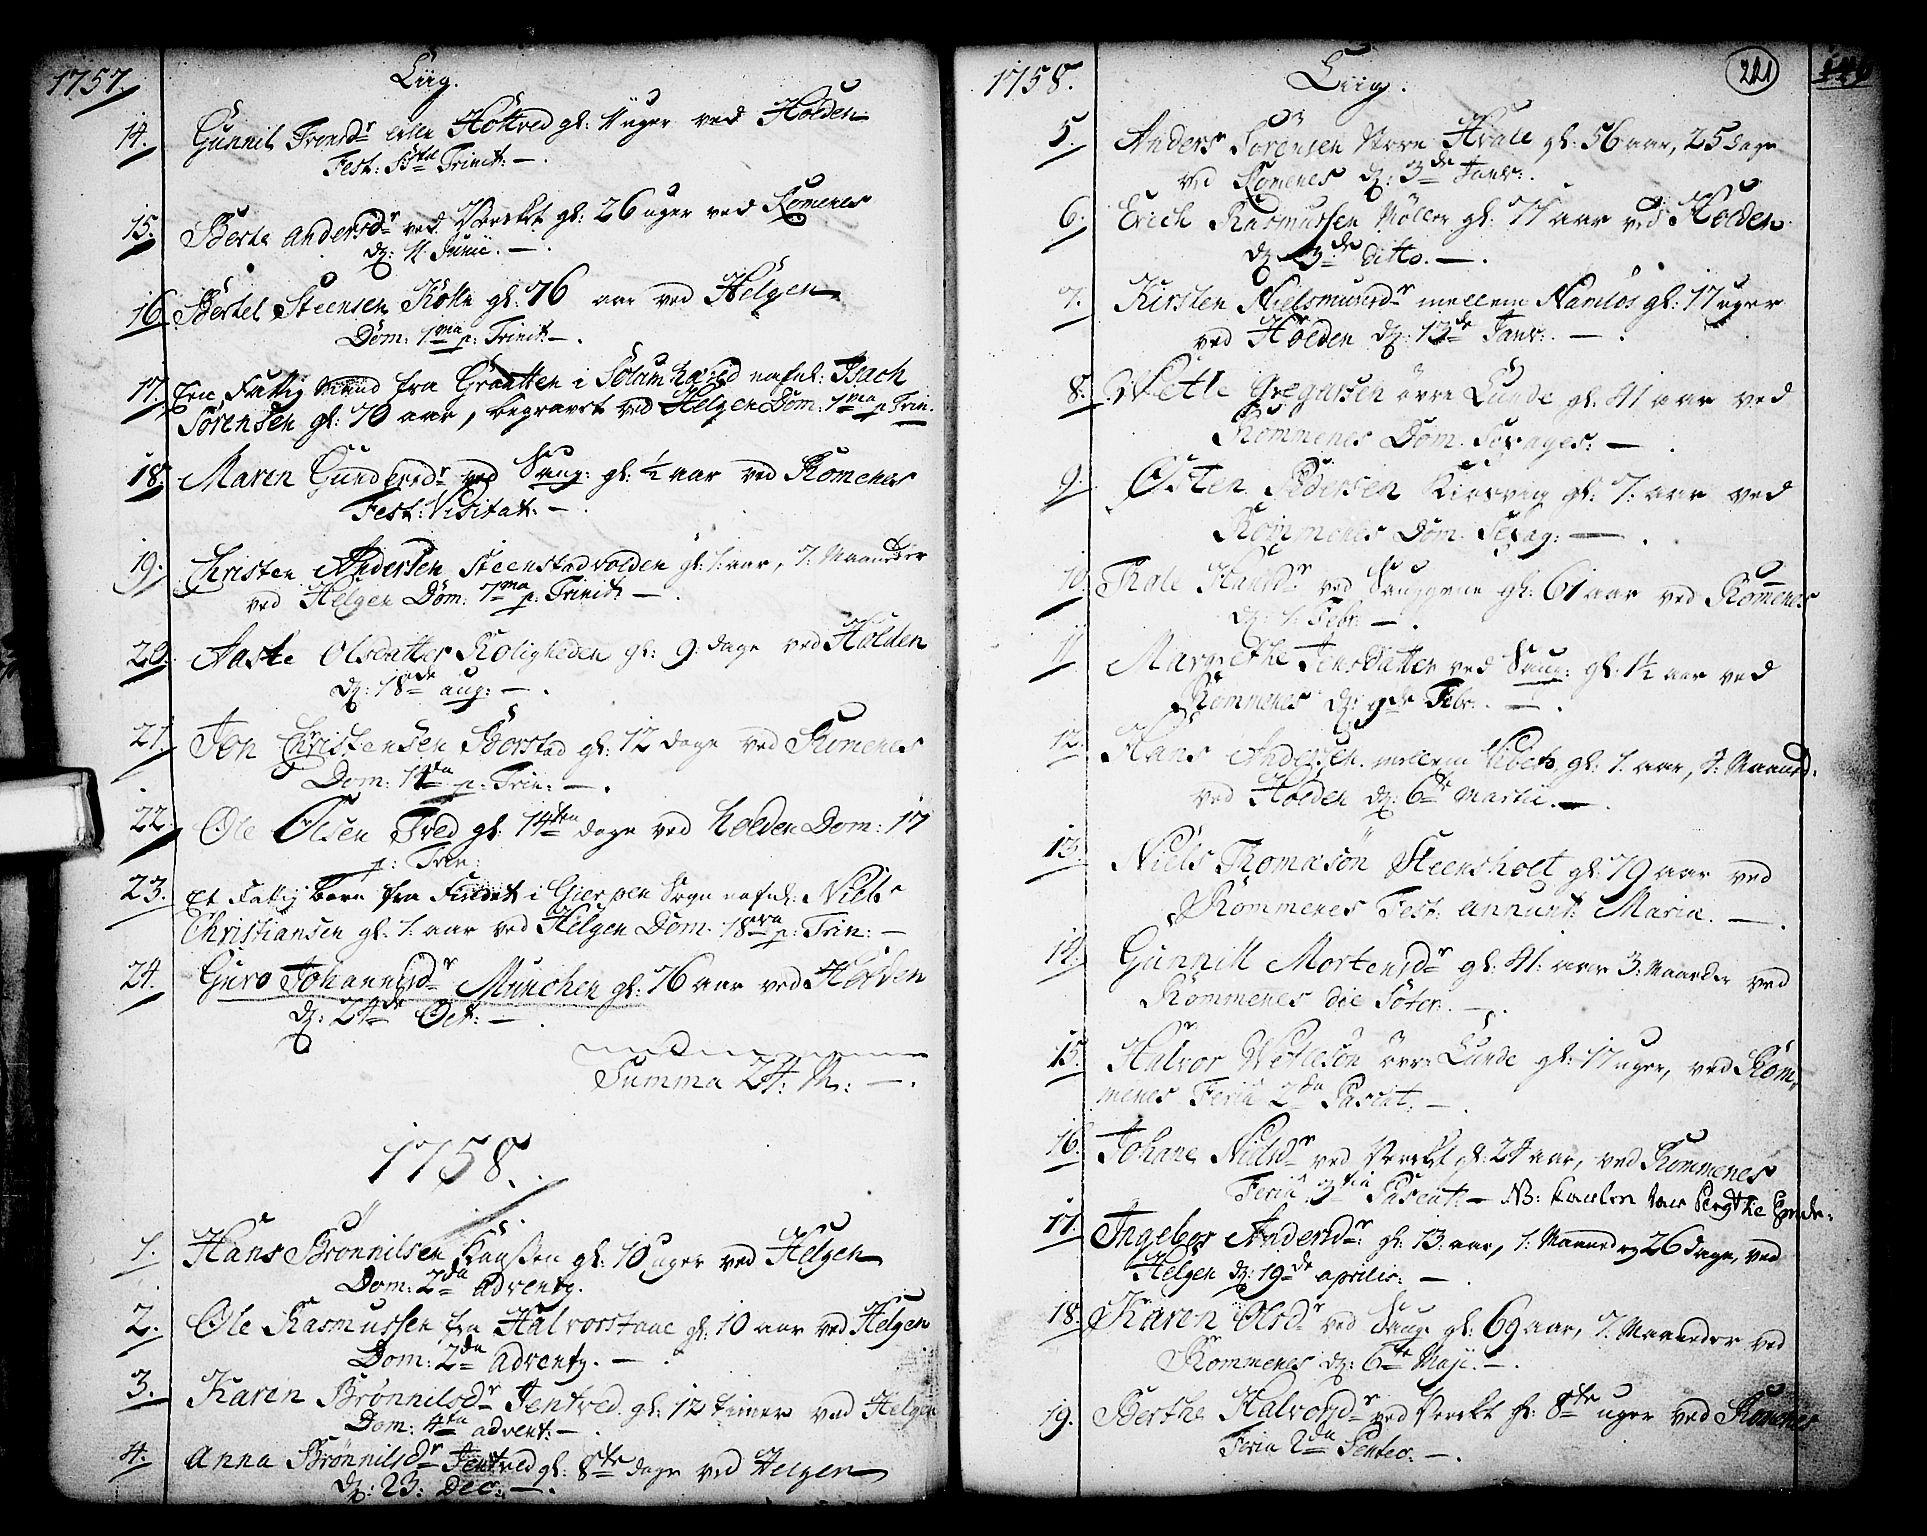 SAKO, Holla kirkebøker, F/Fa/L0001: Ministerialbok nr. 1, 1717-1779, s. 221